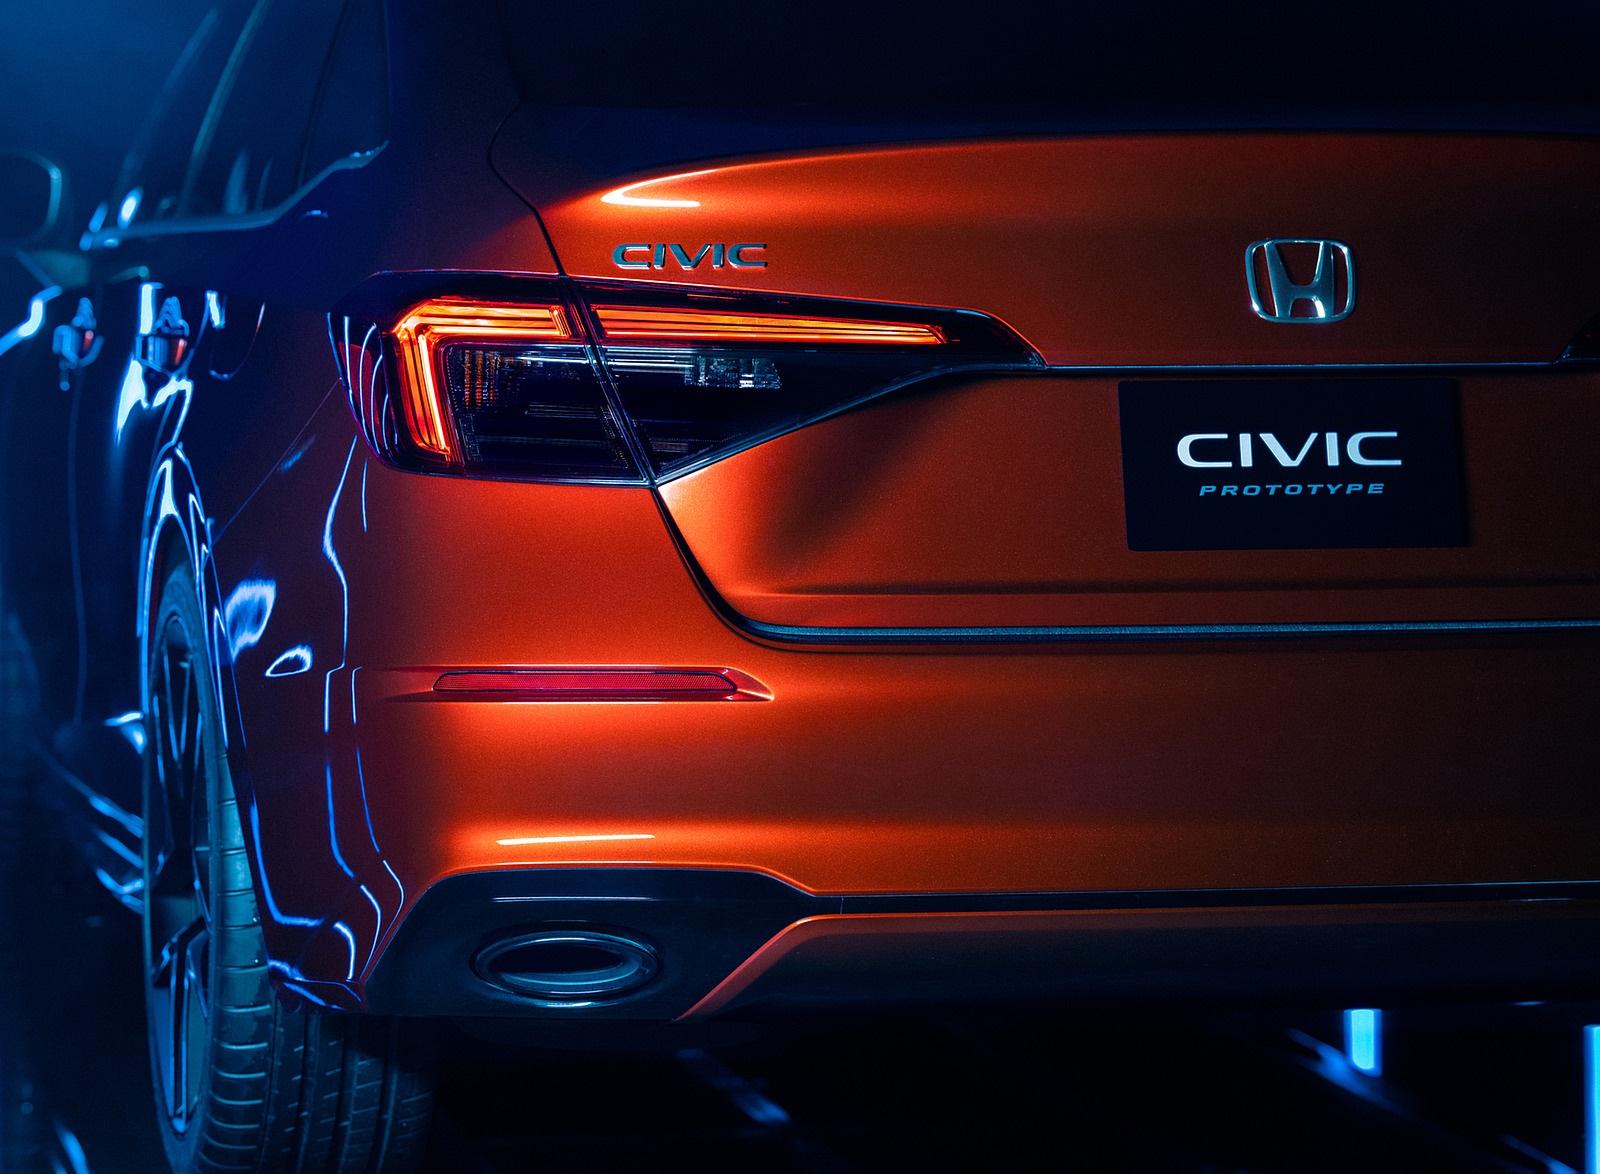 2022 Honda Civic Prototype Tail Light Wallpapers (8)